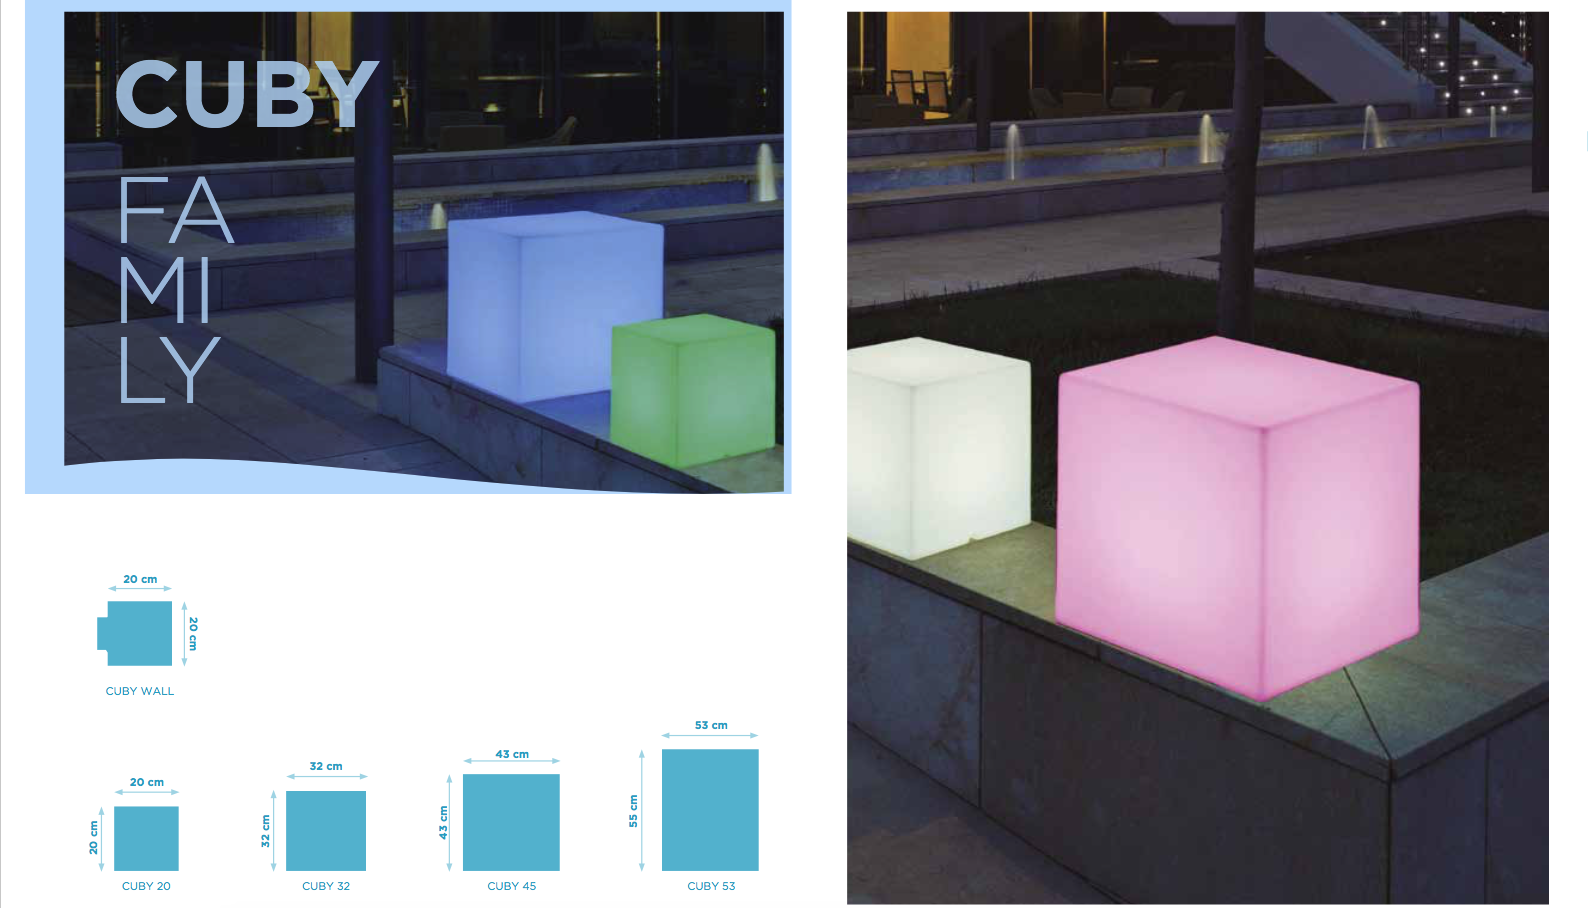 Imagen 2 de Cuby 55 cube iluminado Outdoor light fría 43x43x53cm ... & NewGarden Cuby 55 cube iluminado Outdoor light LUMCB053OFNW ...